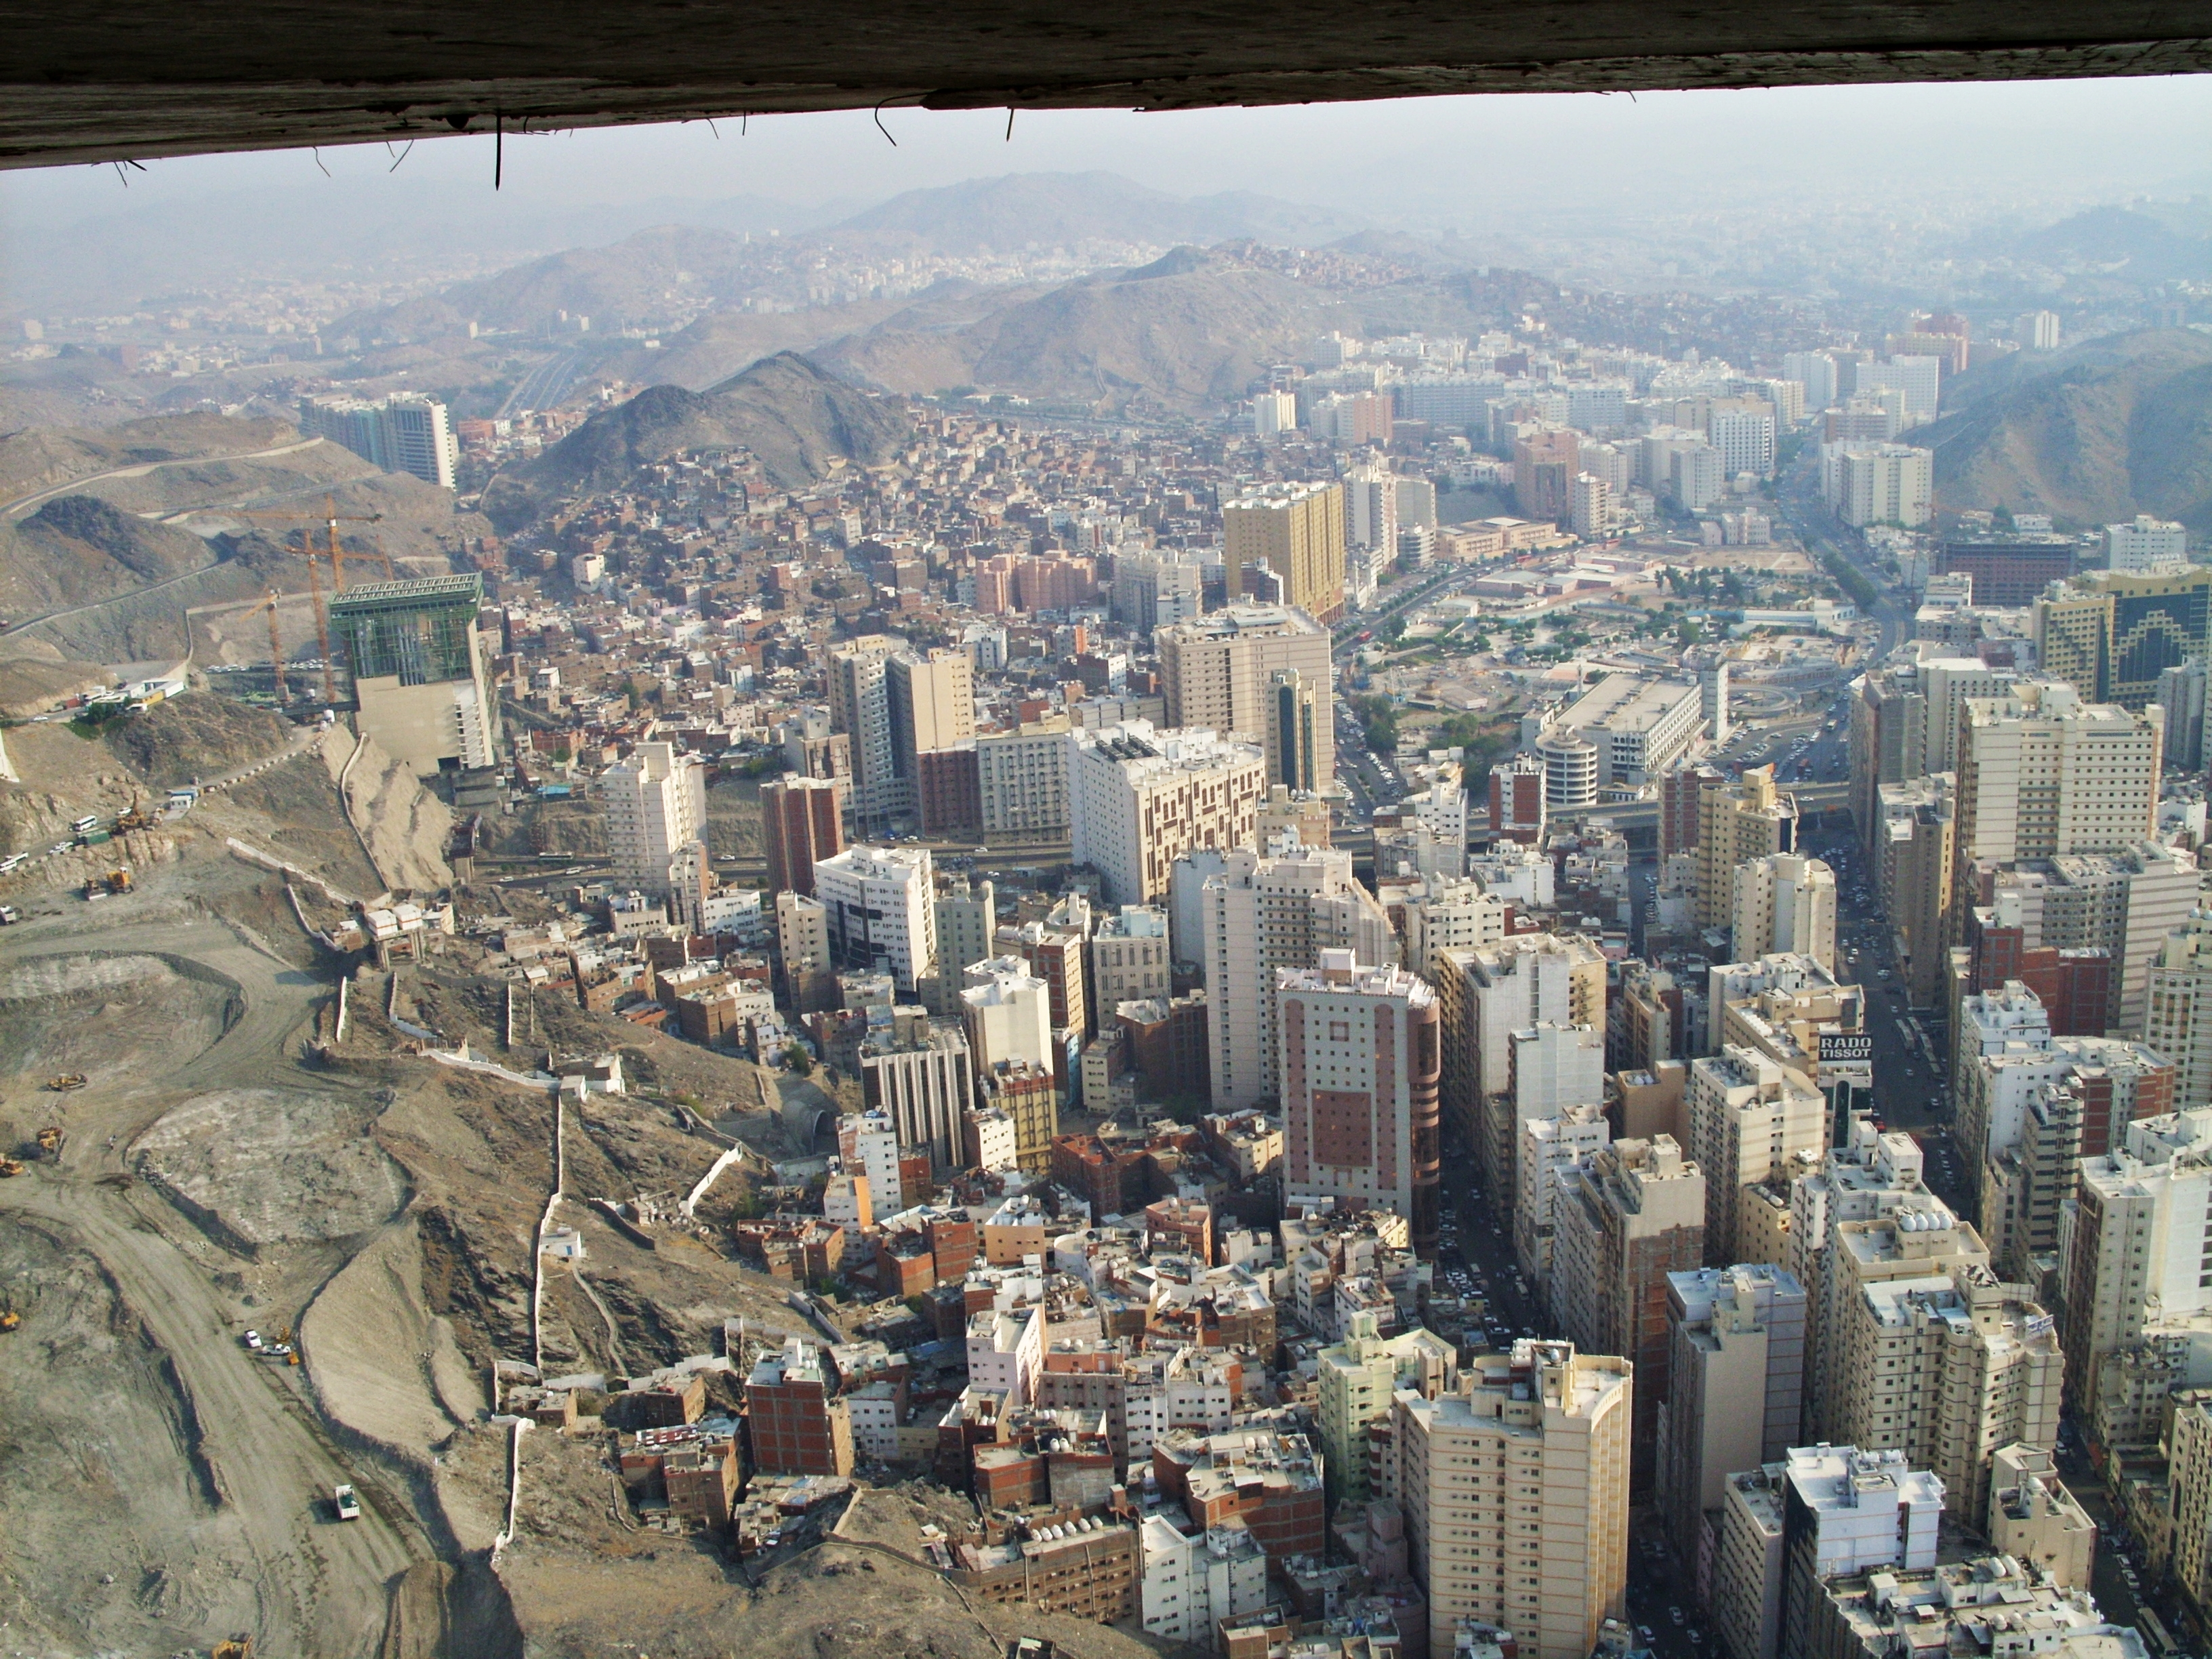 File:Makkah (Mecca) (4).jpg - Wikimedia Commons